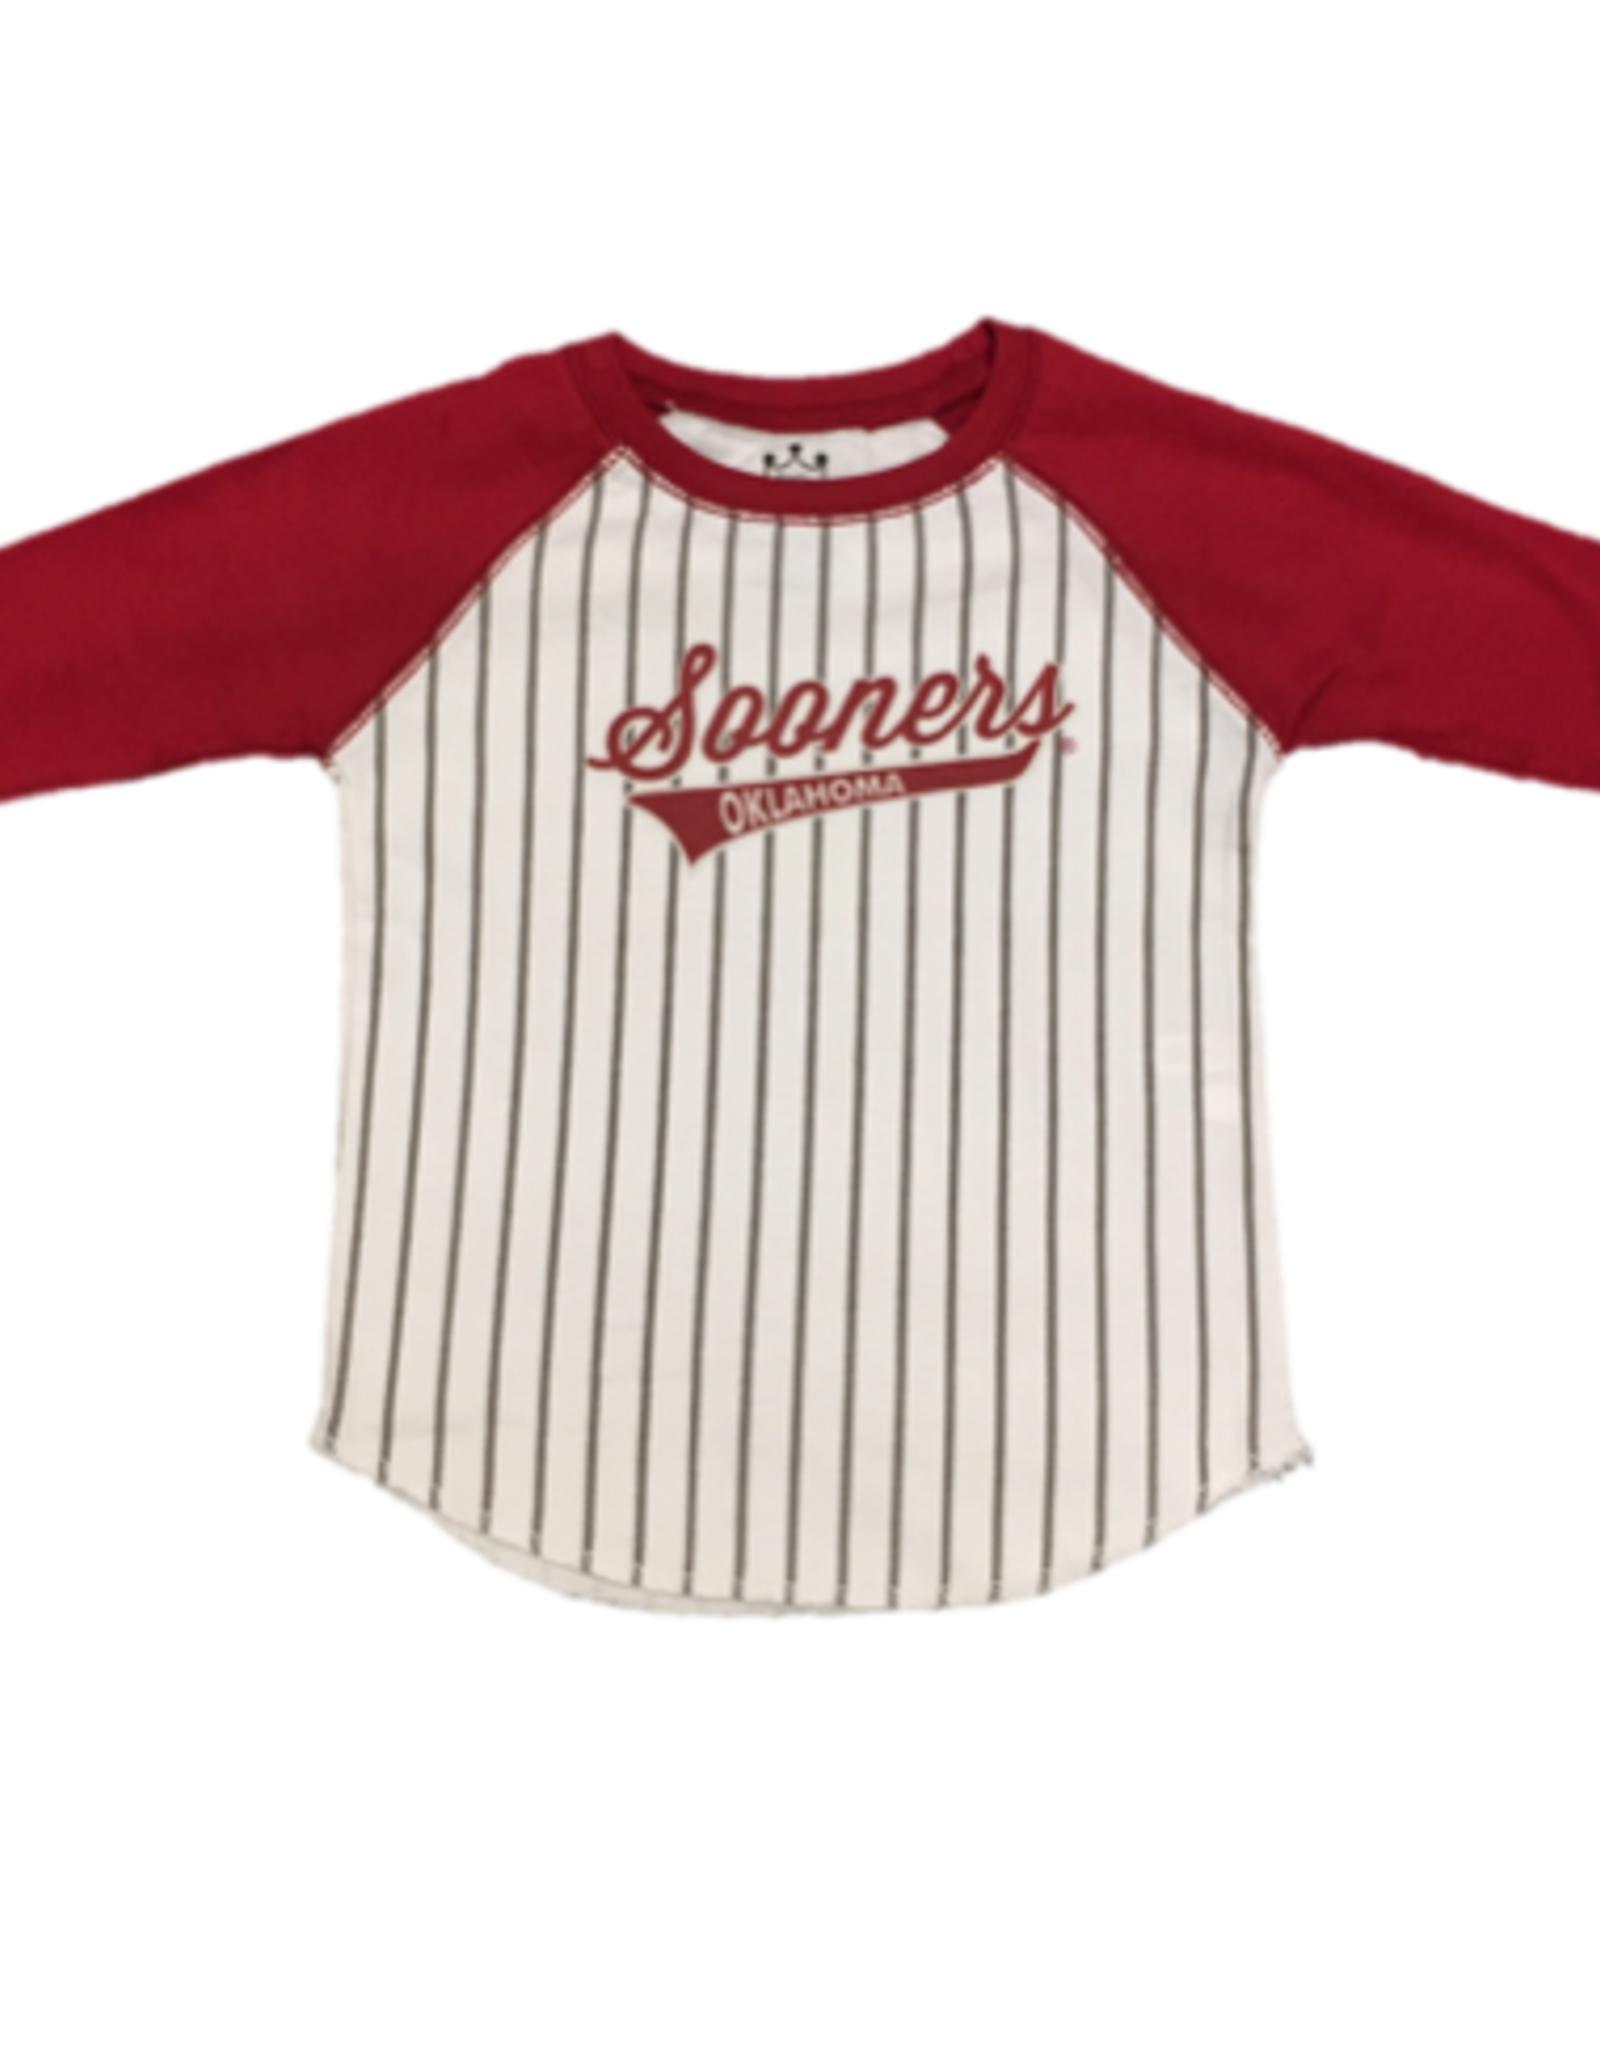 Little King Toddler Sooners Oklahoma 3/4 Sleeve Baseball Tee